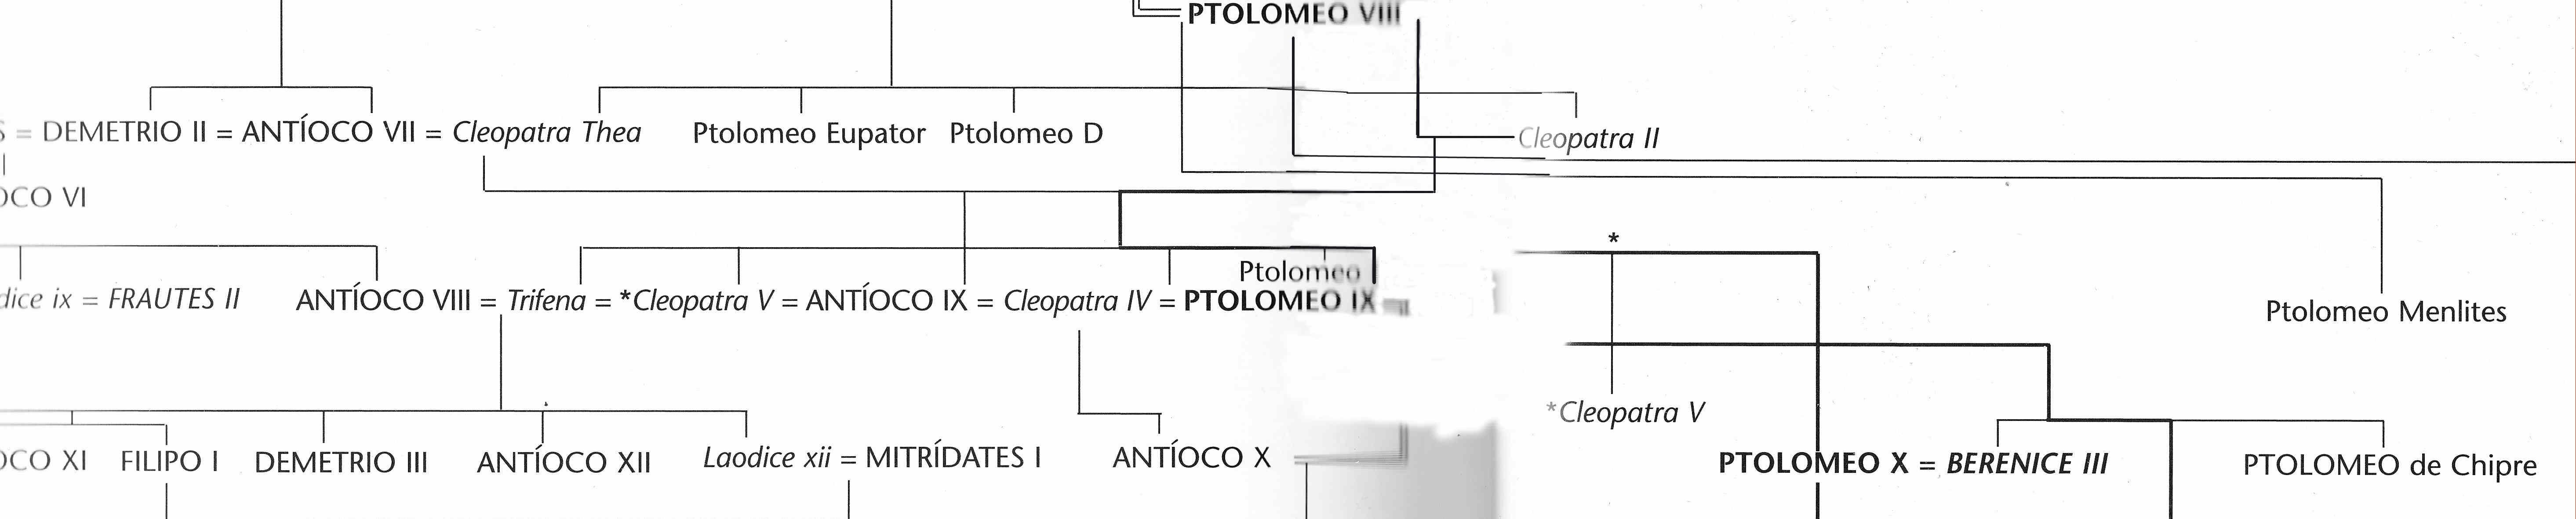 Egipto Antiguo 45 y Ptolomeo VIII Evergetes 4